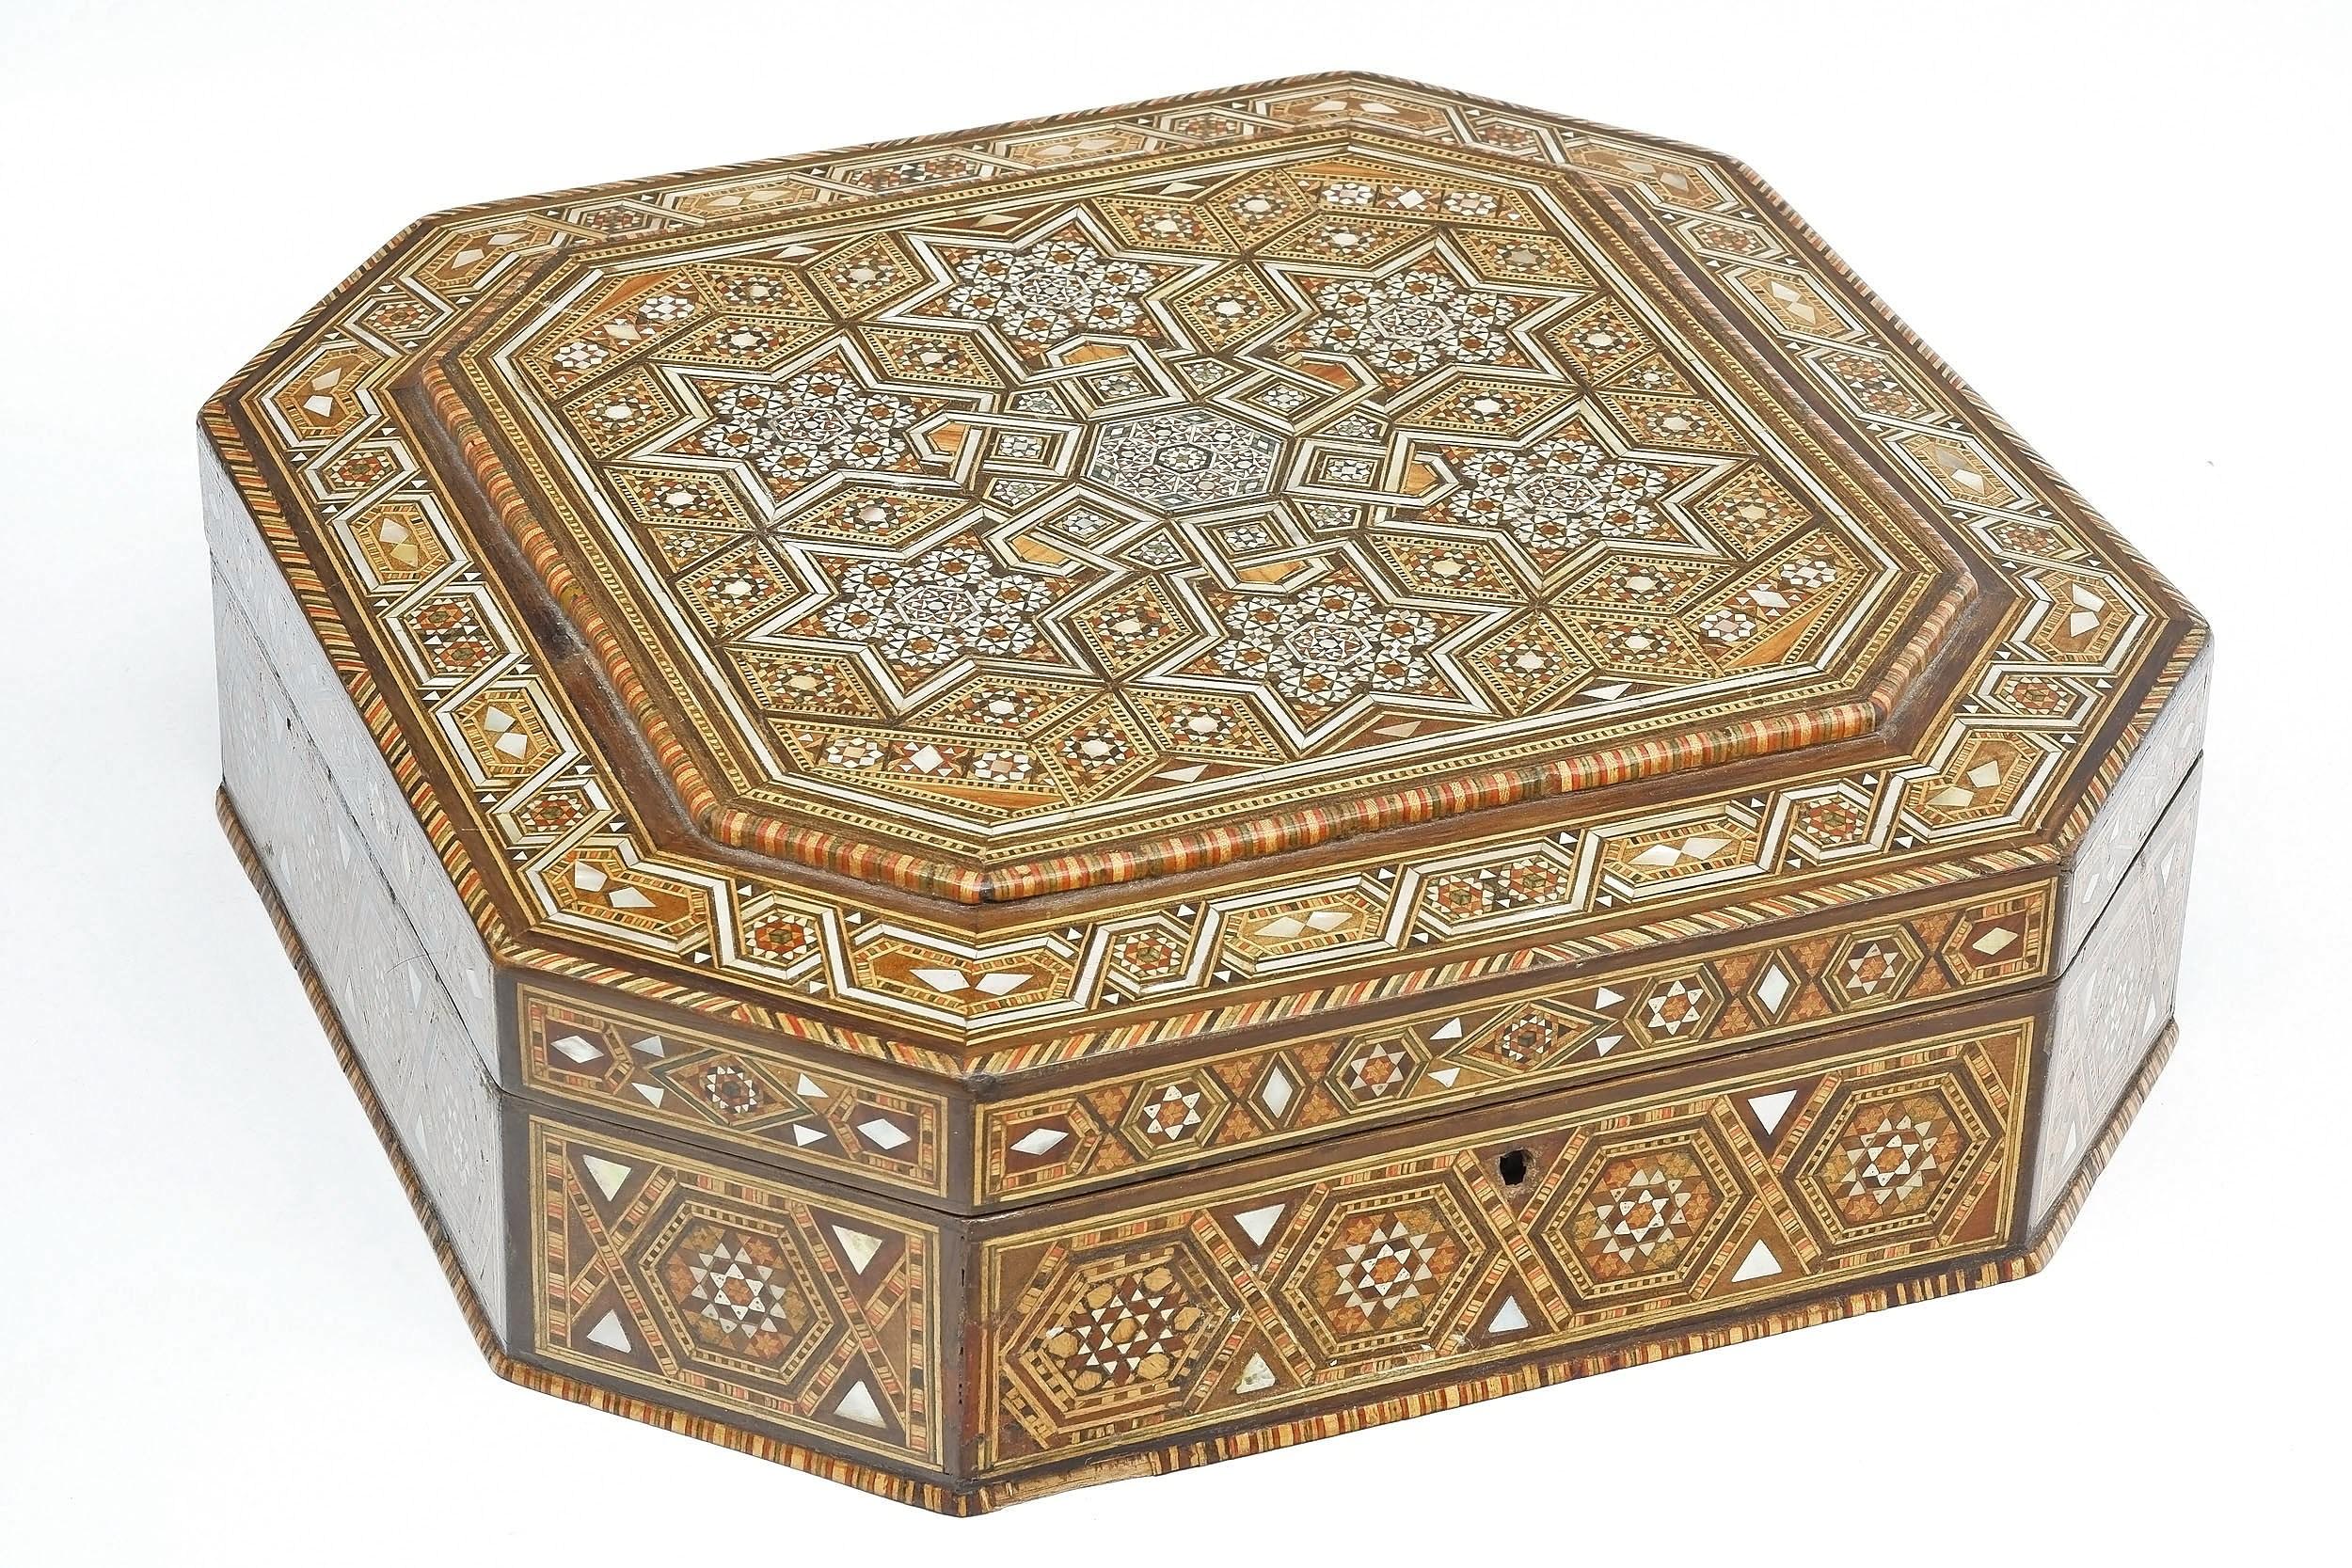 'Superb Syrian Sadeli Work Marquetry Inlaid Octagonal Box'